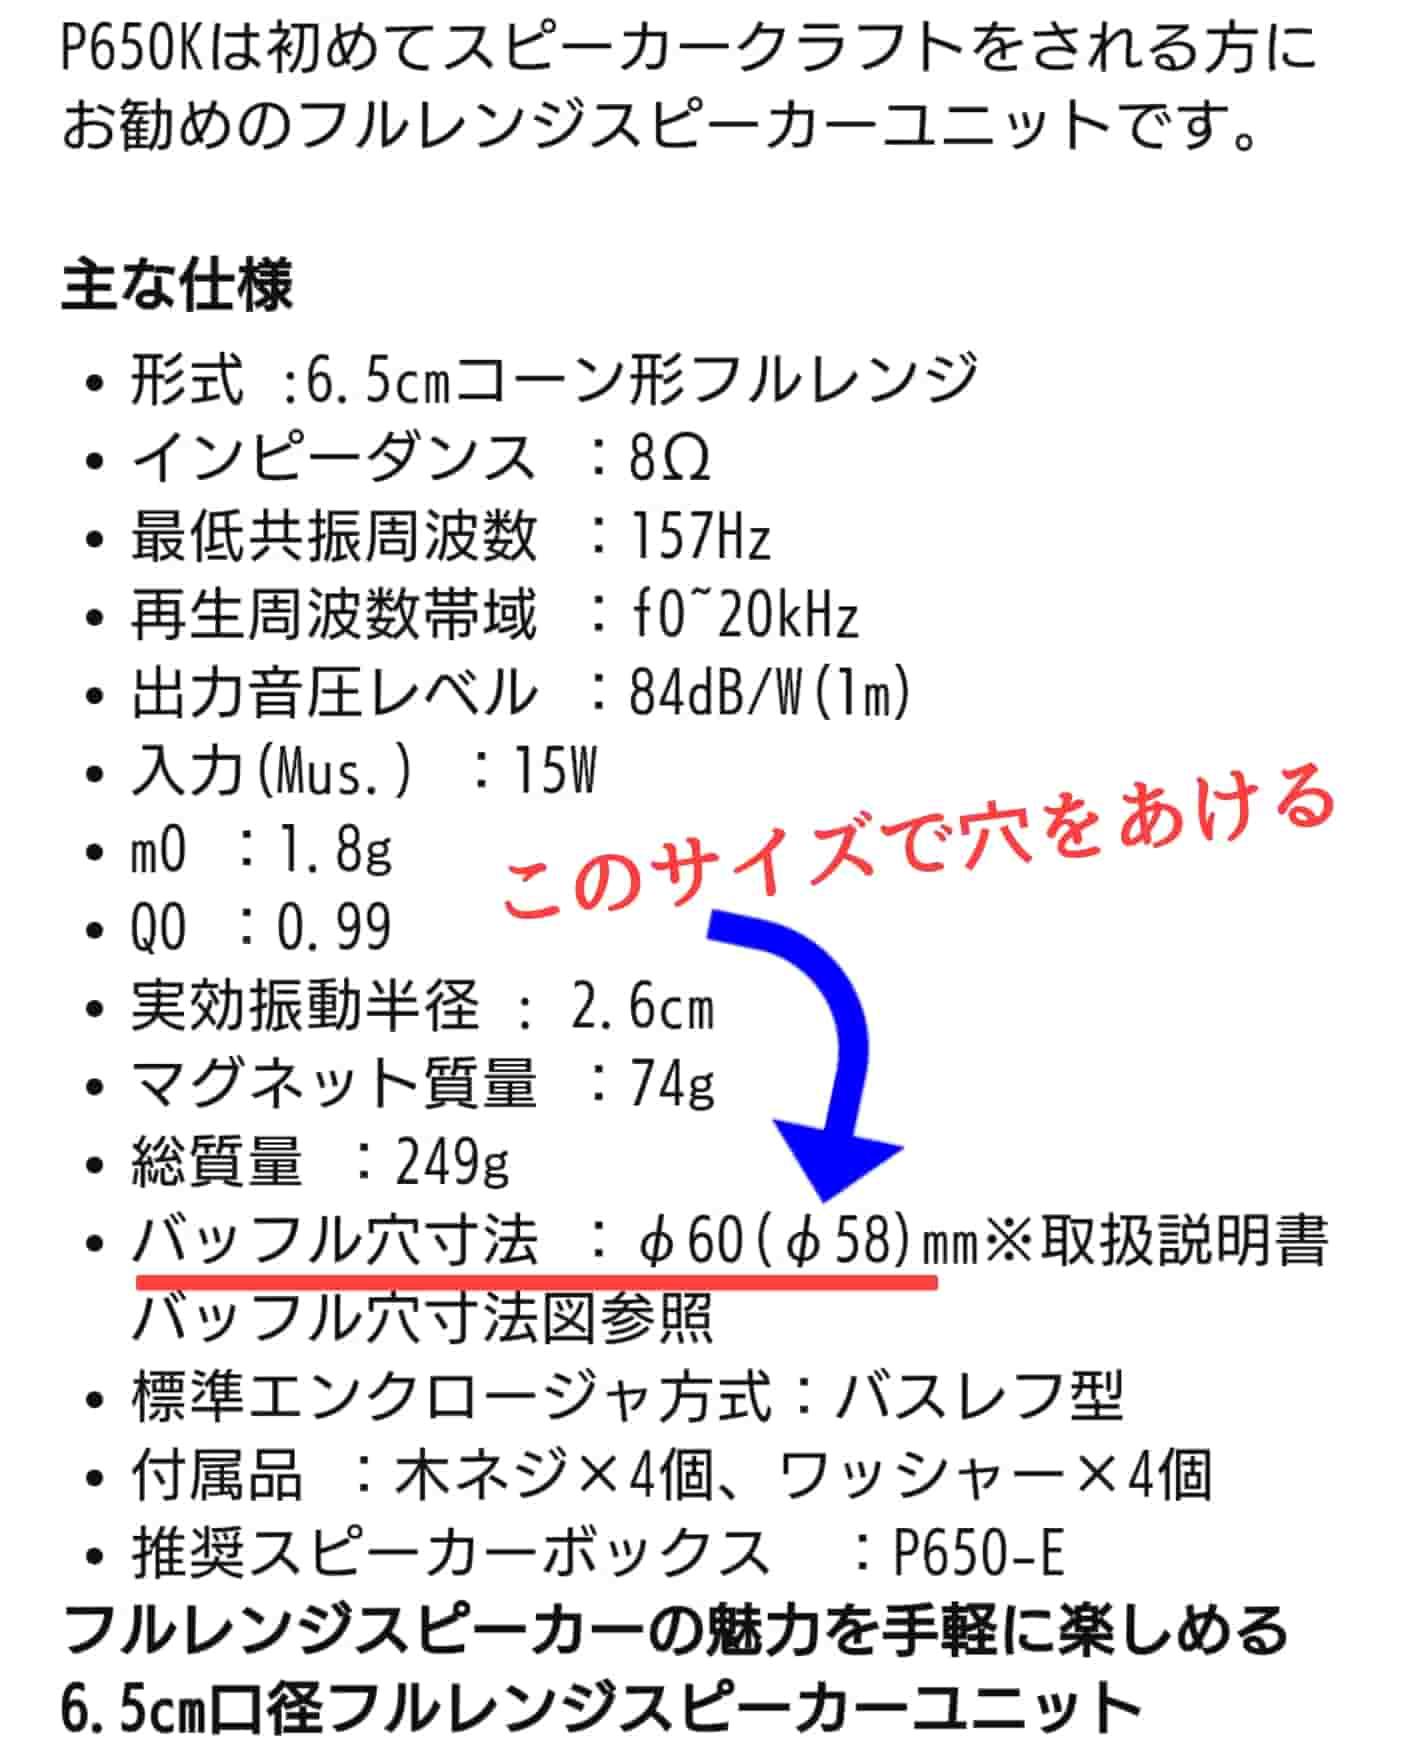 p650kの製品仕様書